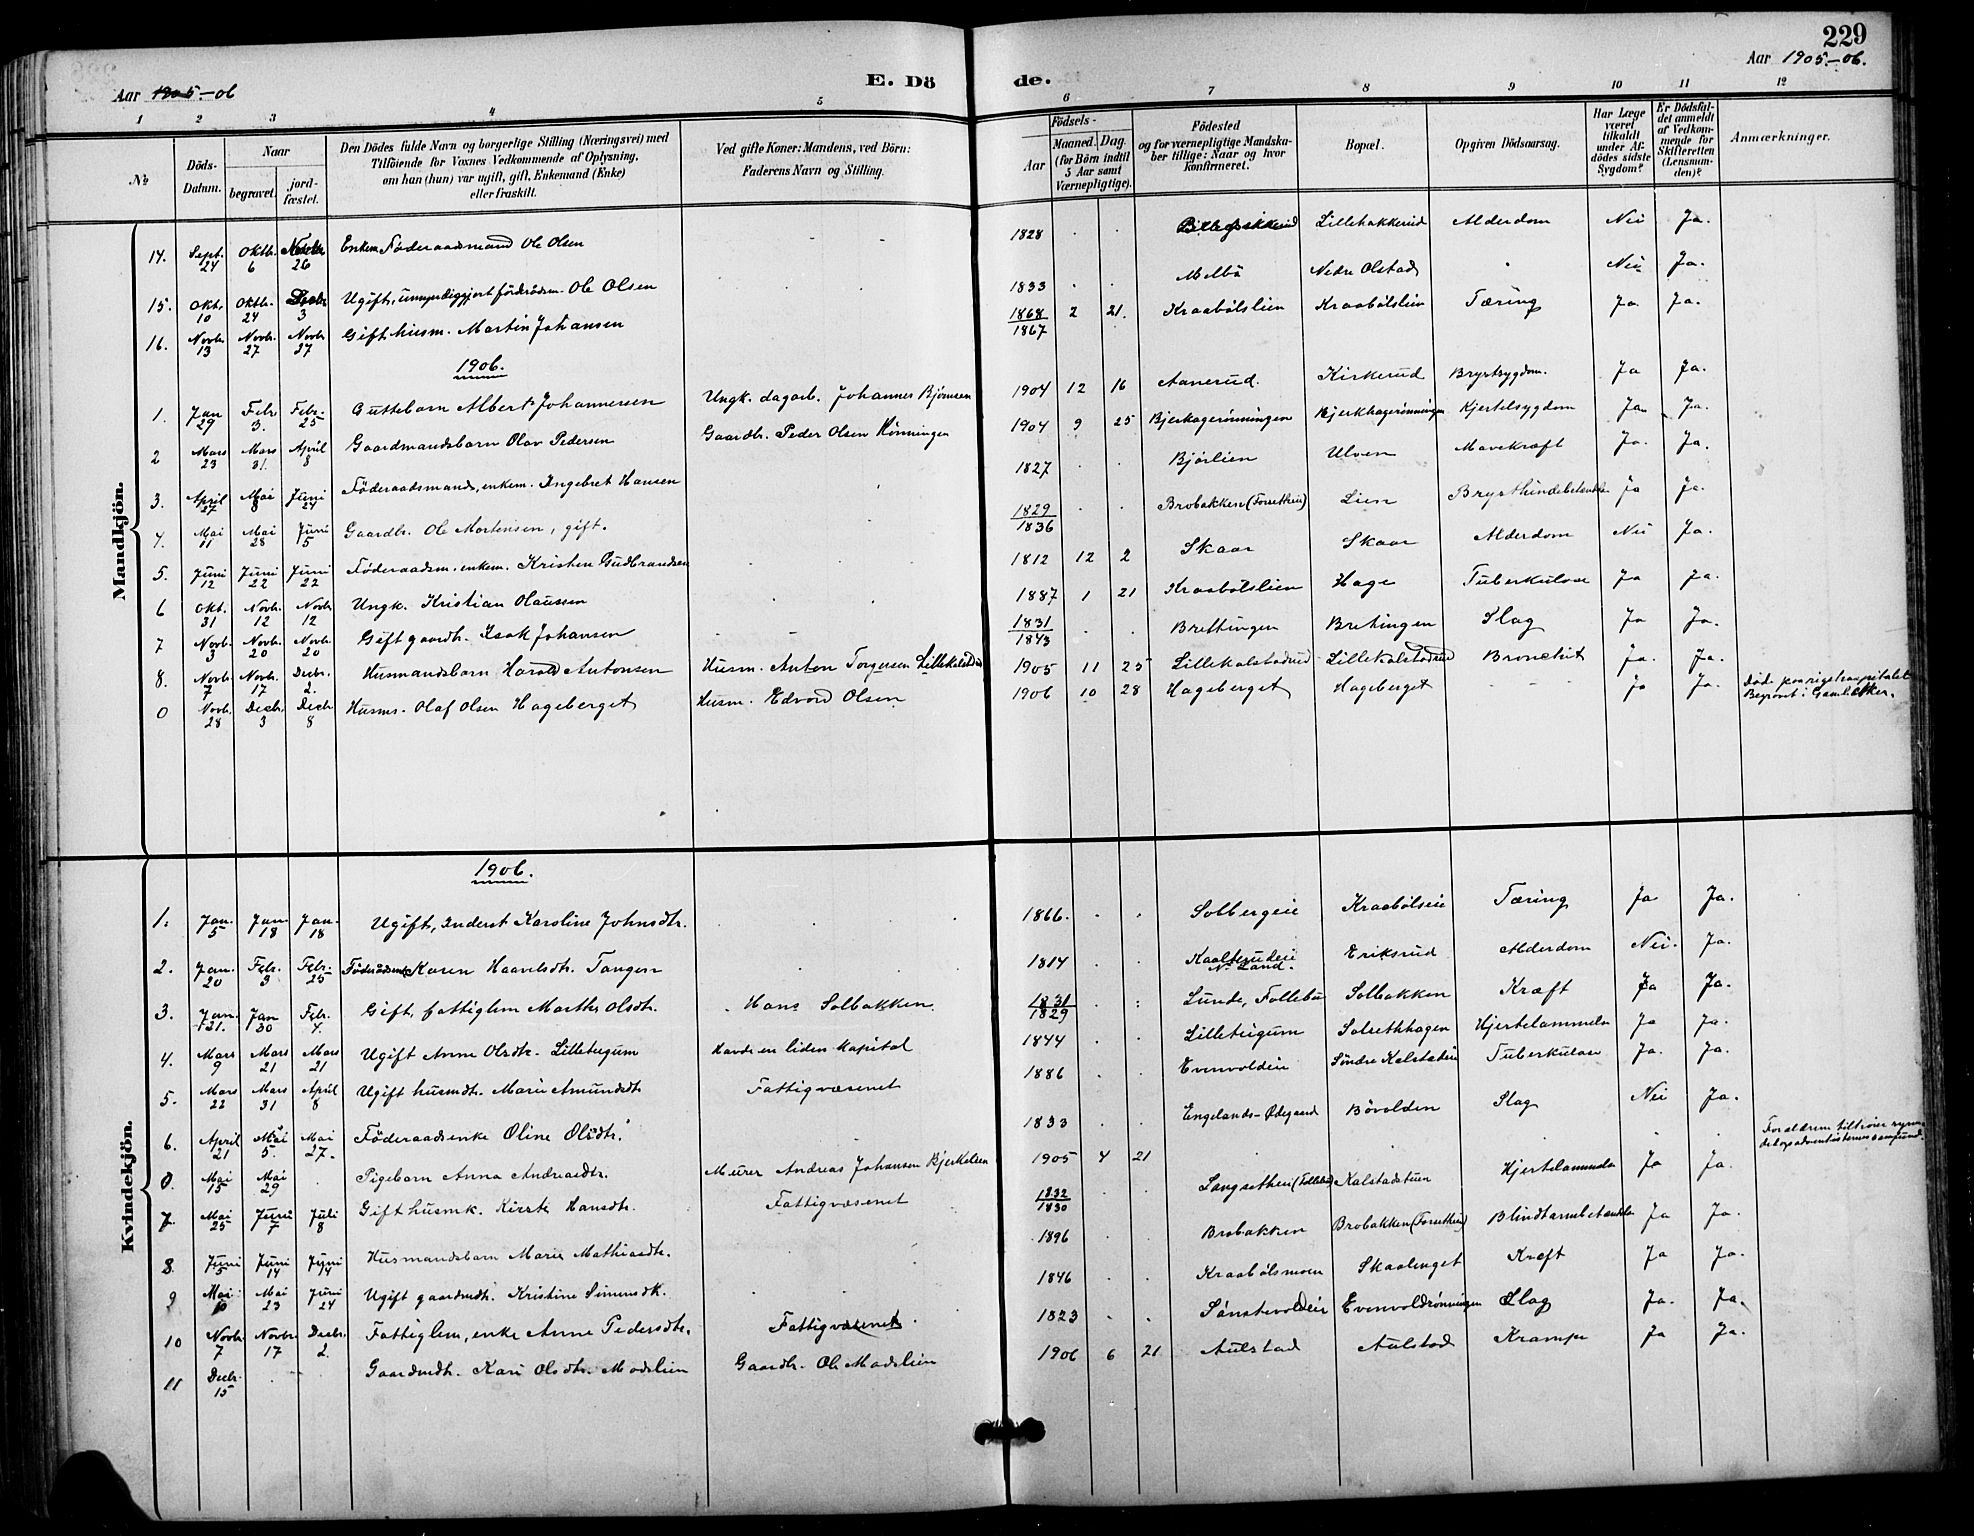 SAH, Vestre Gausdal prestekontor, Klokkerbok nr. 3, 1896-1925, s. 229